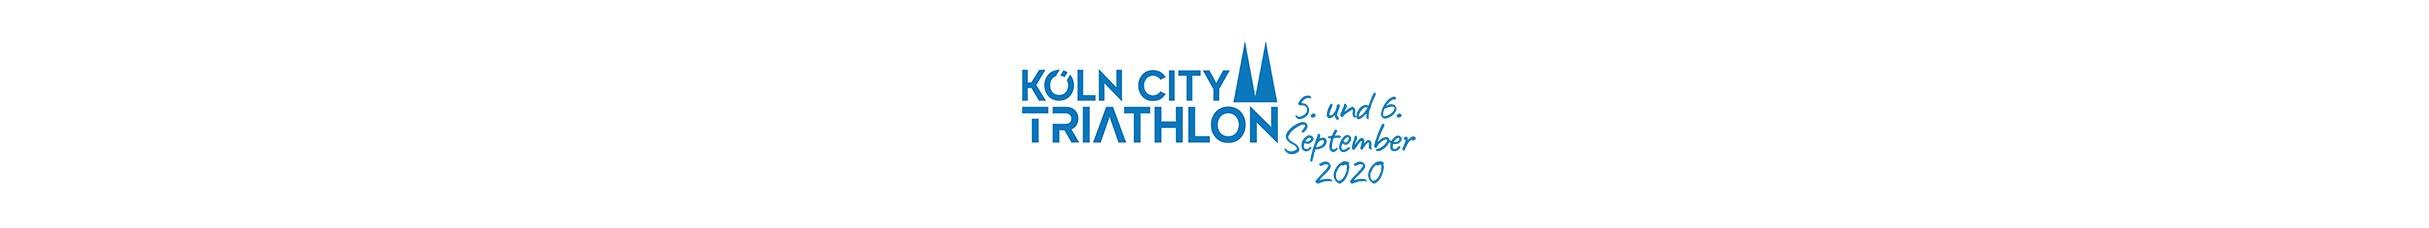 Köln City Triathlon